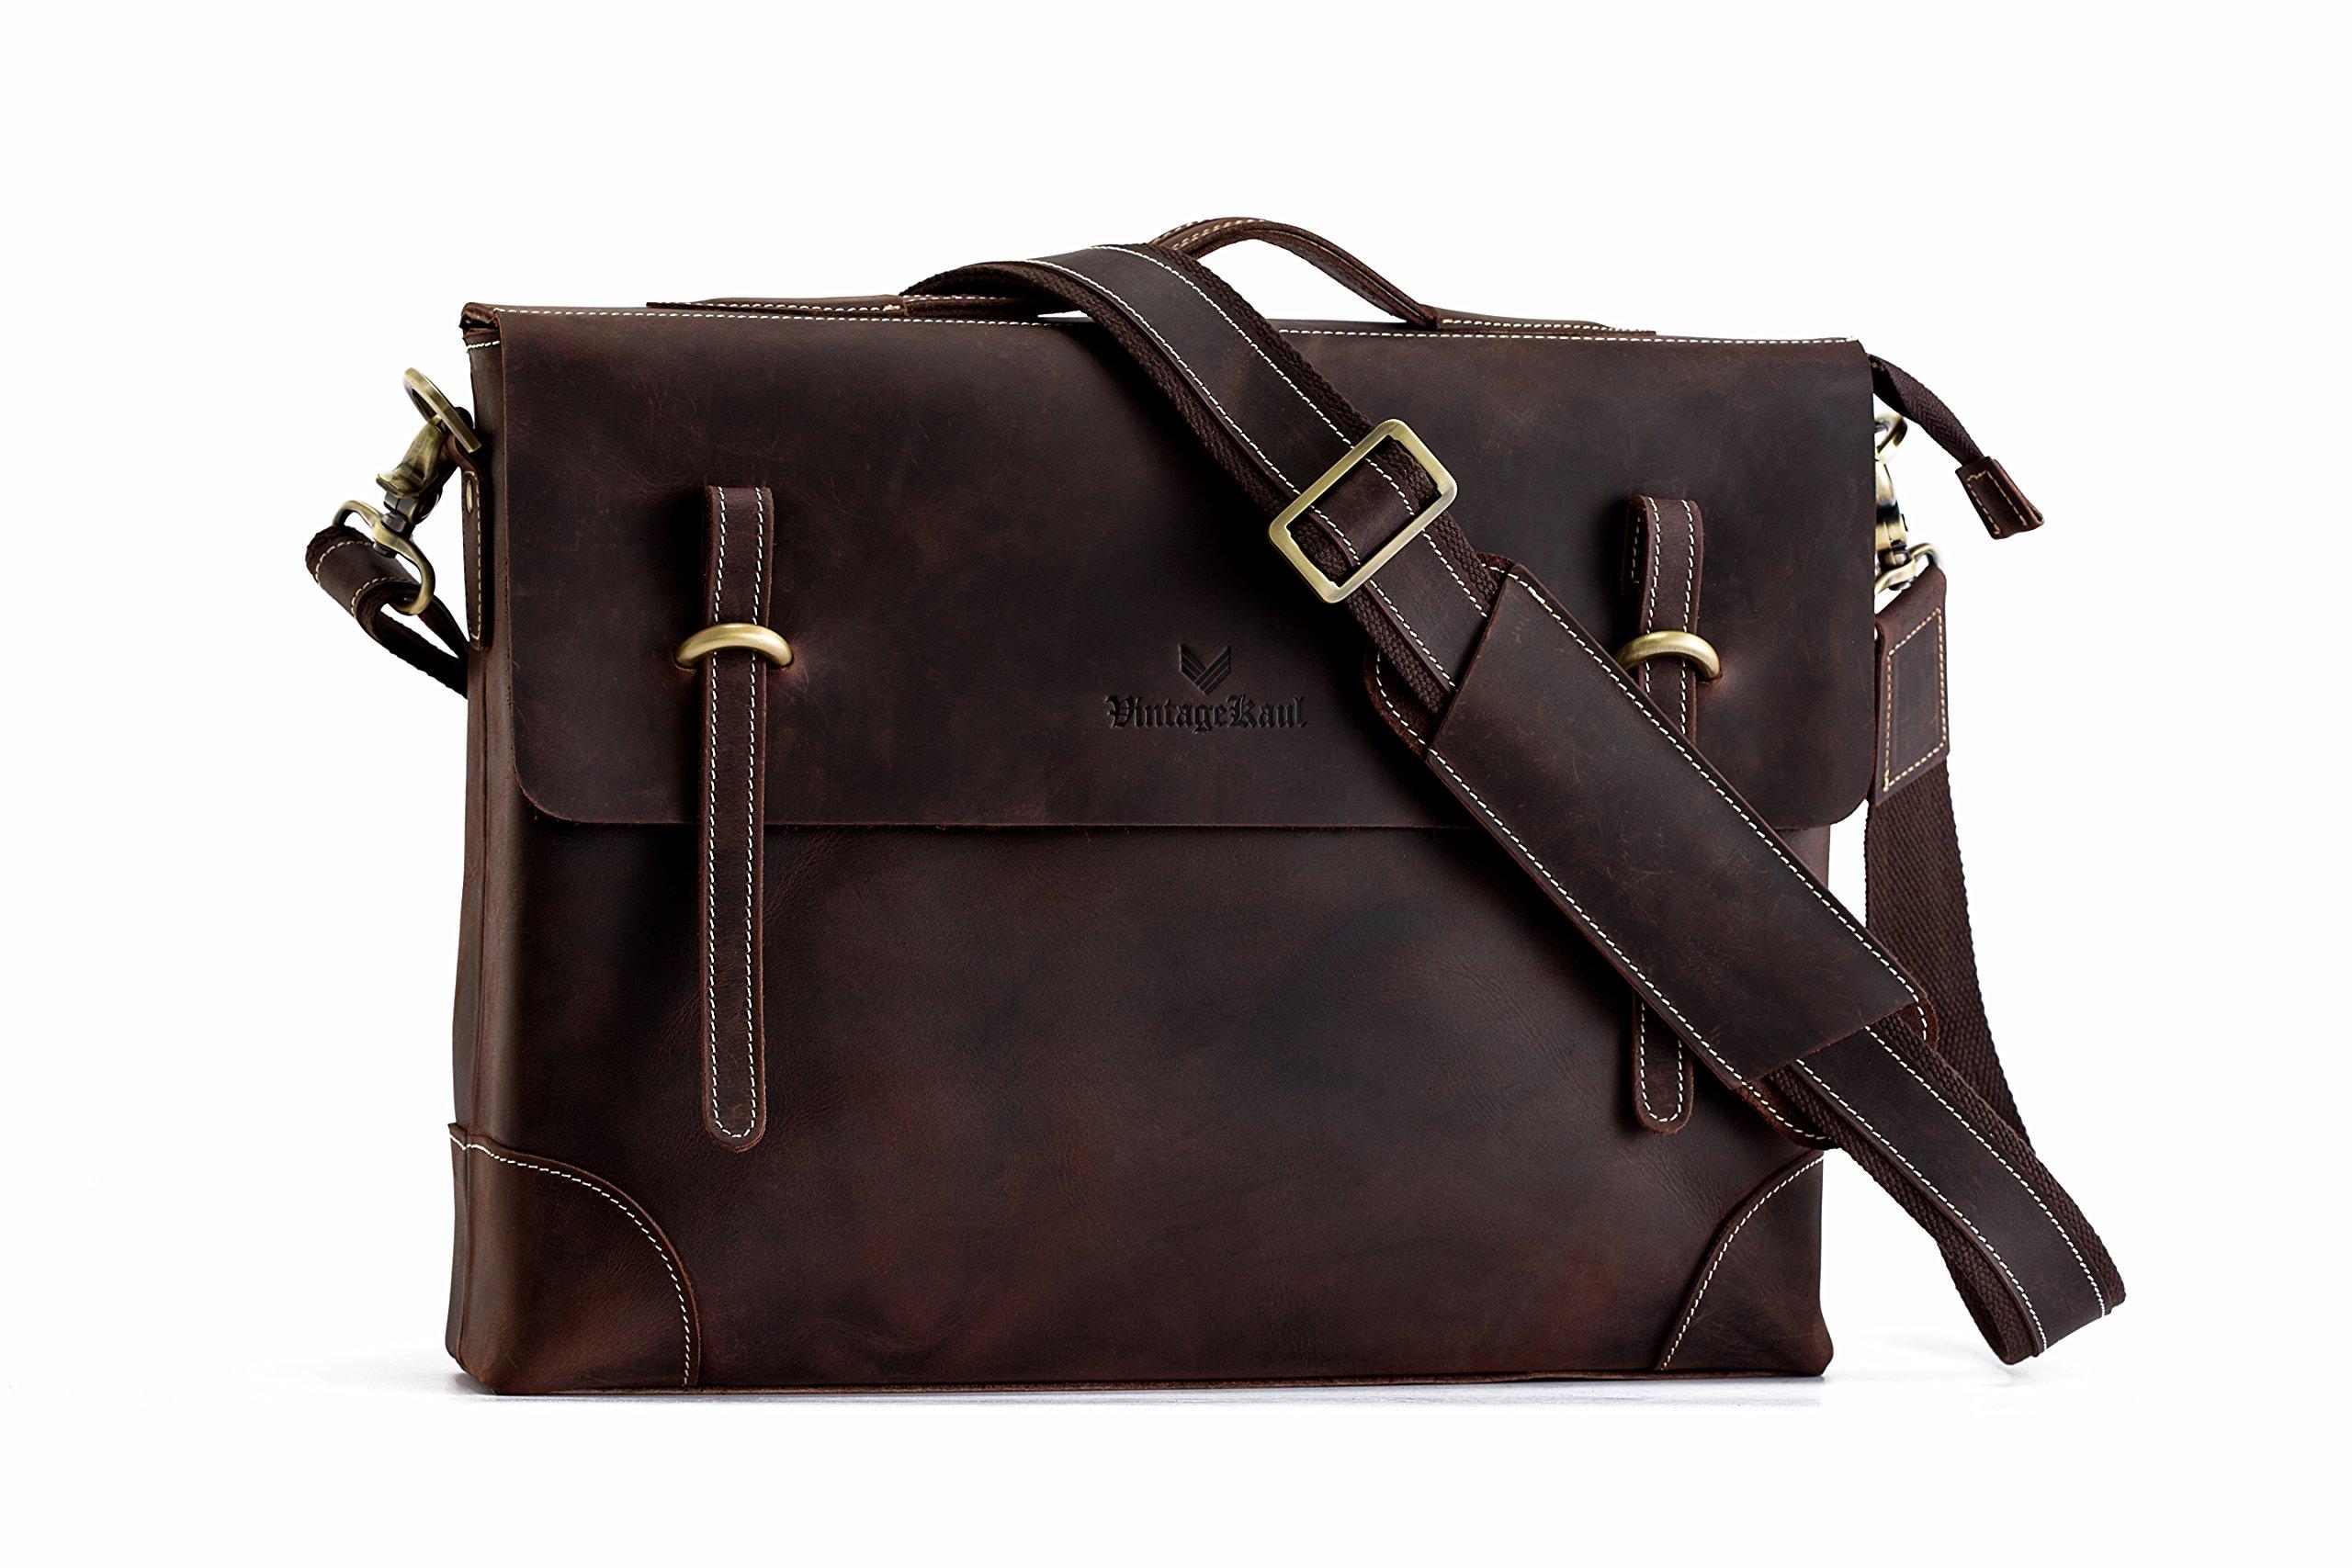 Men's Leather Messenger Bag   15inch 100% Italian Crazy Horse Leather Laptop Shoulder Briefcase   Imported Genuine Italian Leather Crossbody Satchel   Tote Bag   Computer bag   Retro Bag